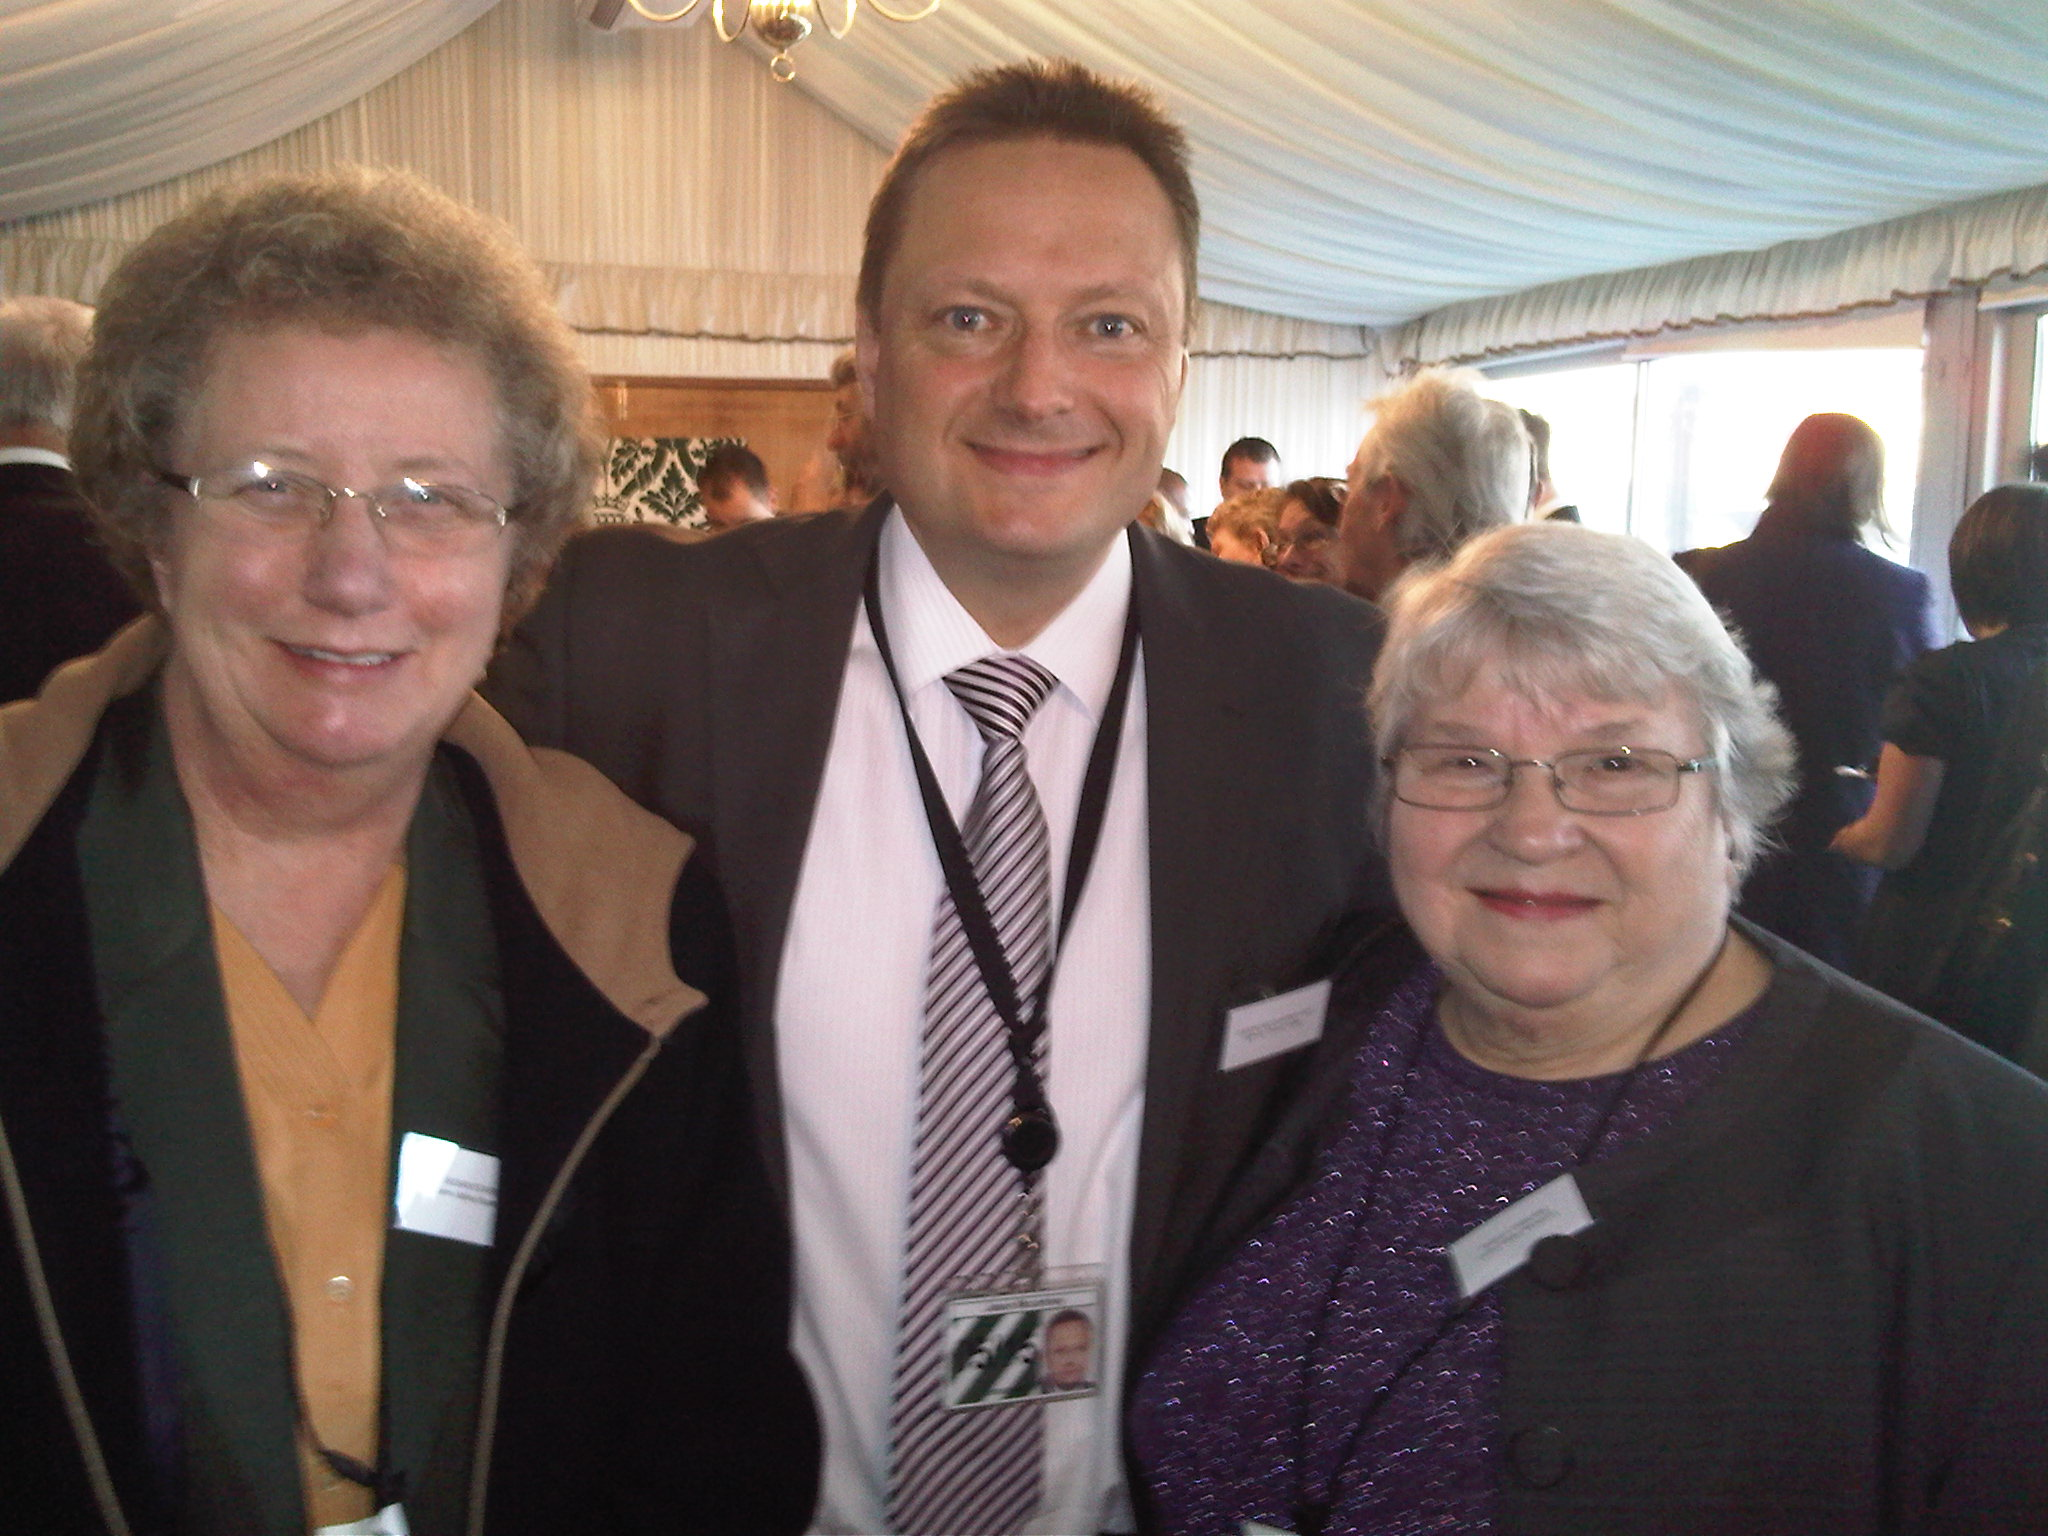 2010 Sandford Awards for Heritage Education